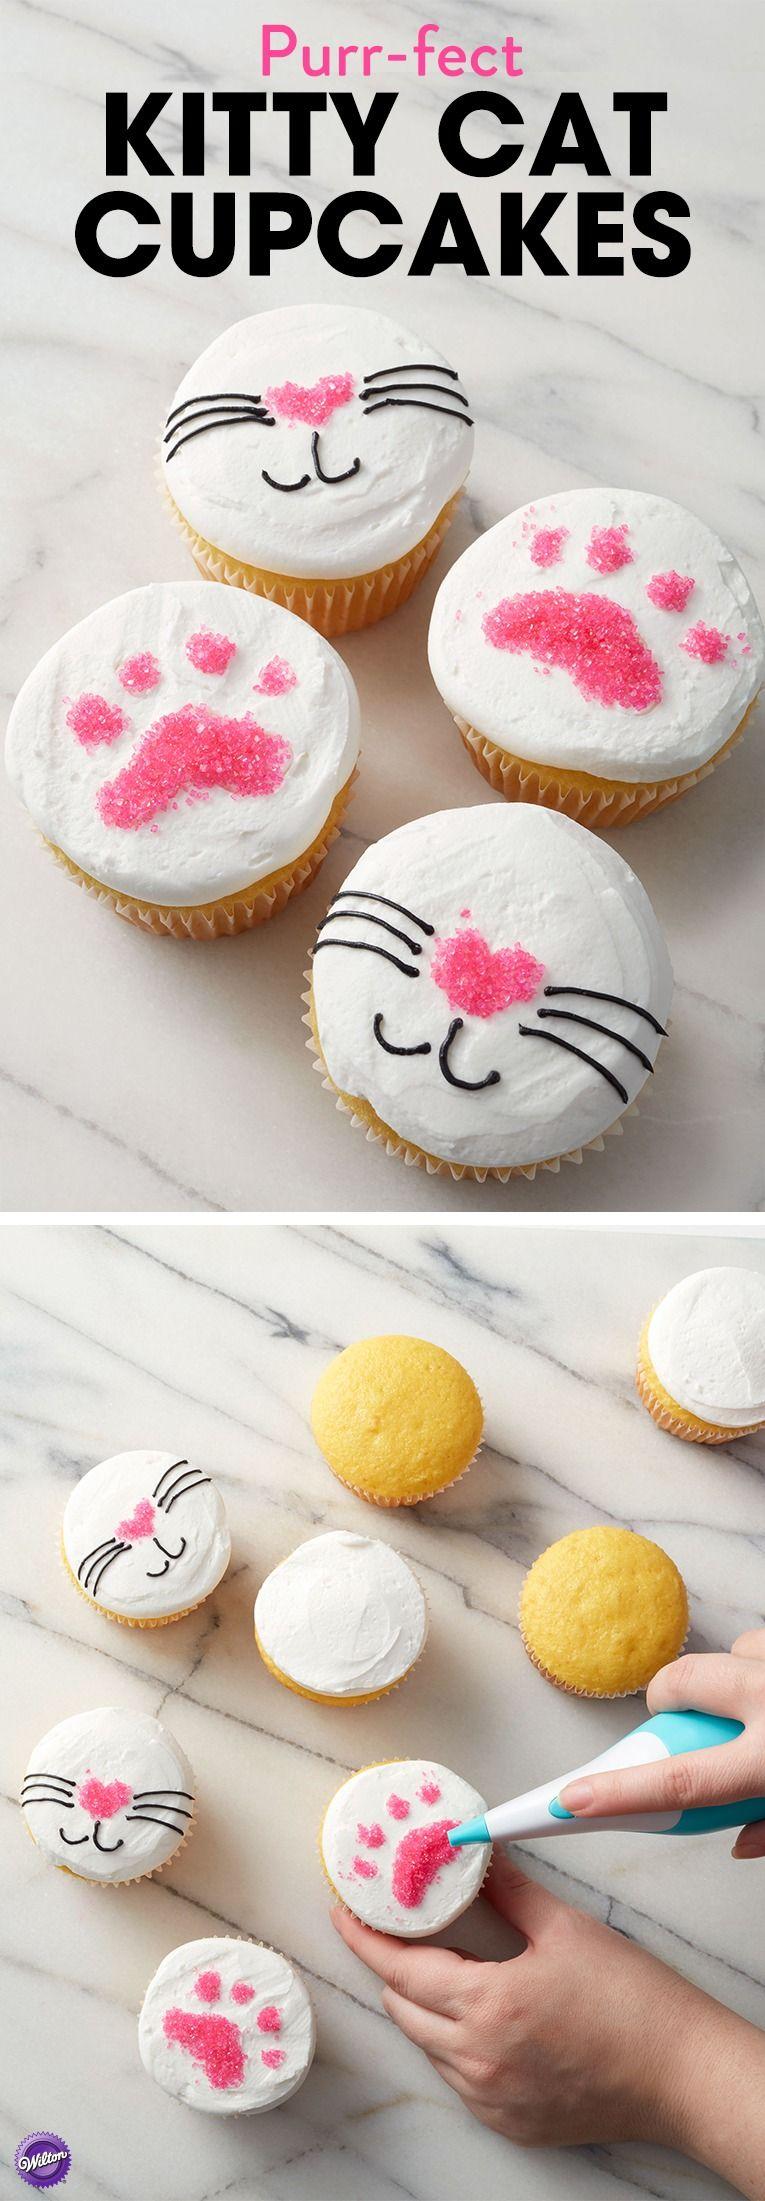 Sugar Writer Pur-fect Kitty Cat Cupcakes